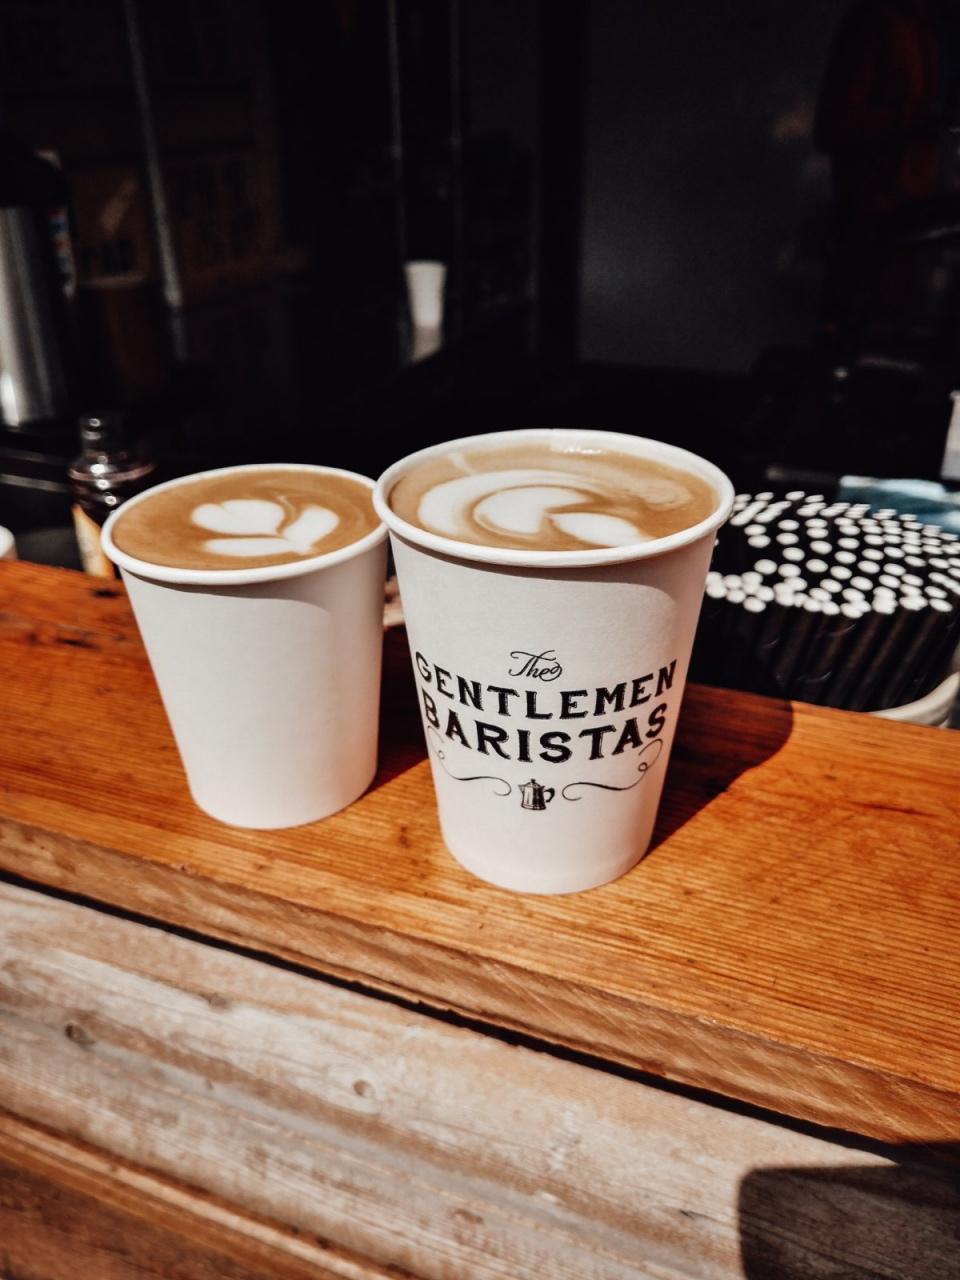 The Gentlemen Baristas coffee at Vinegar Yard Market